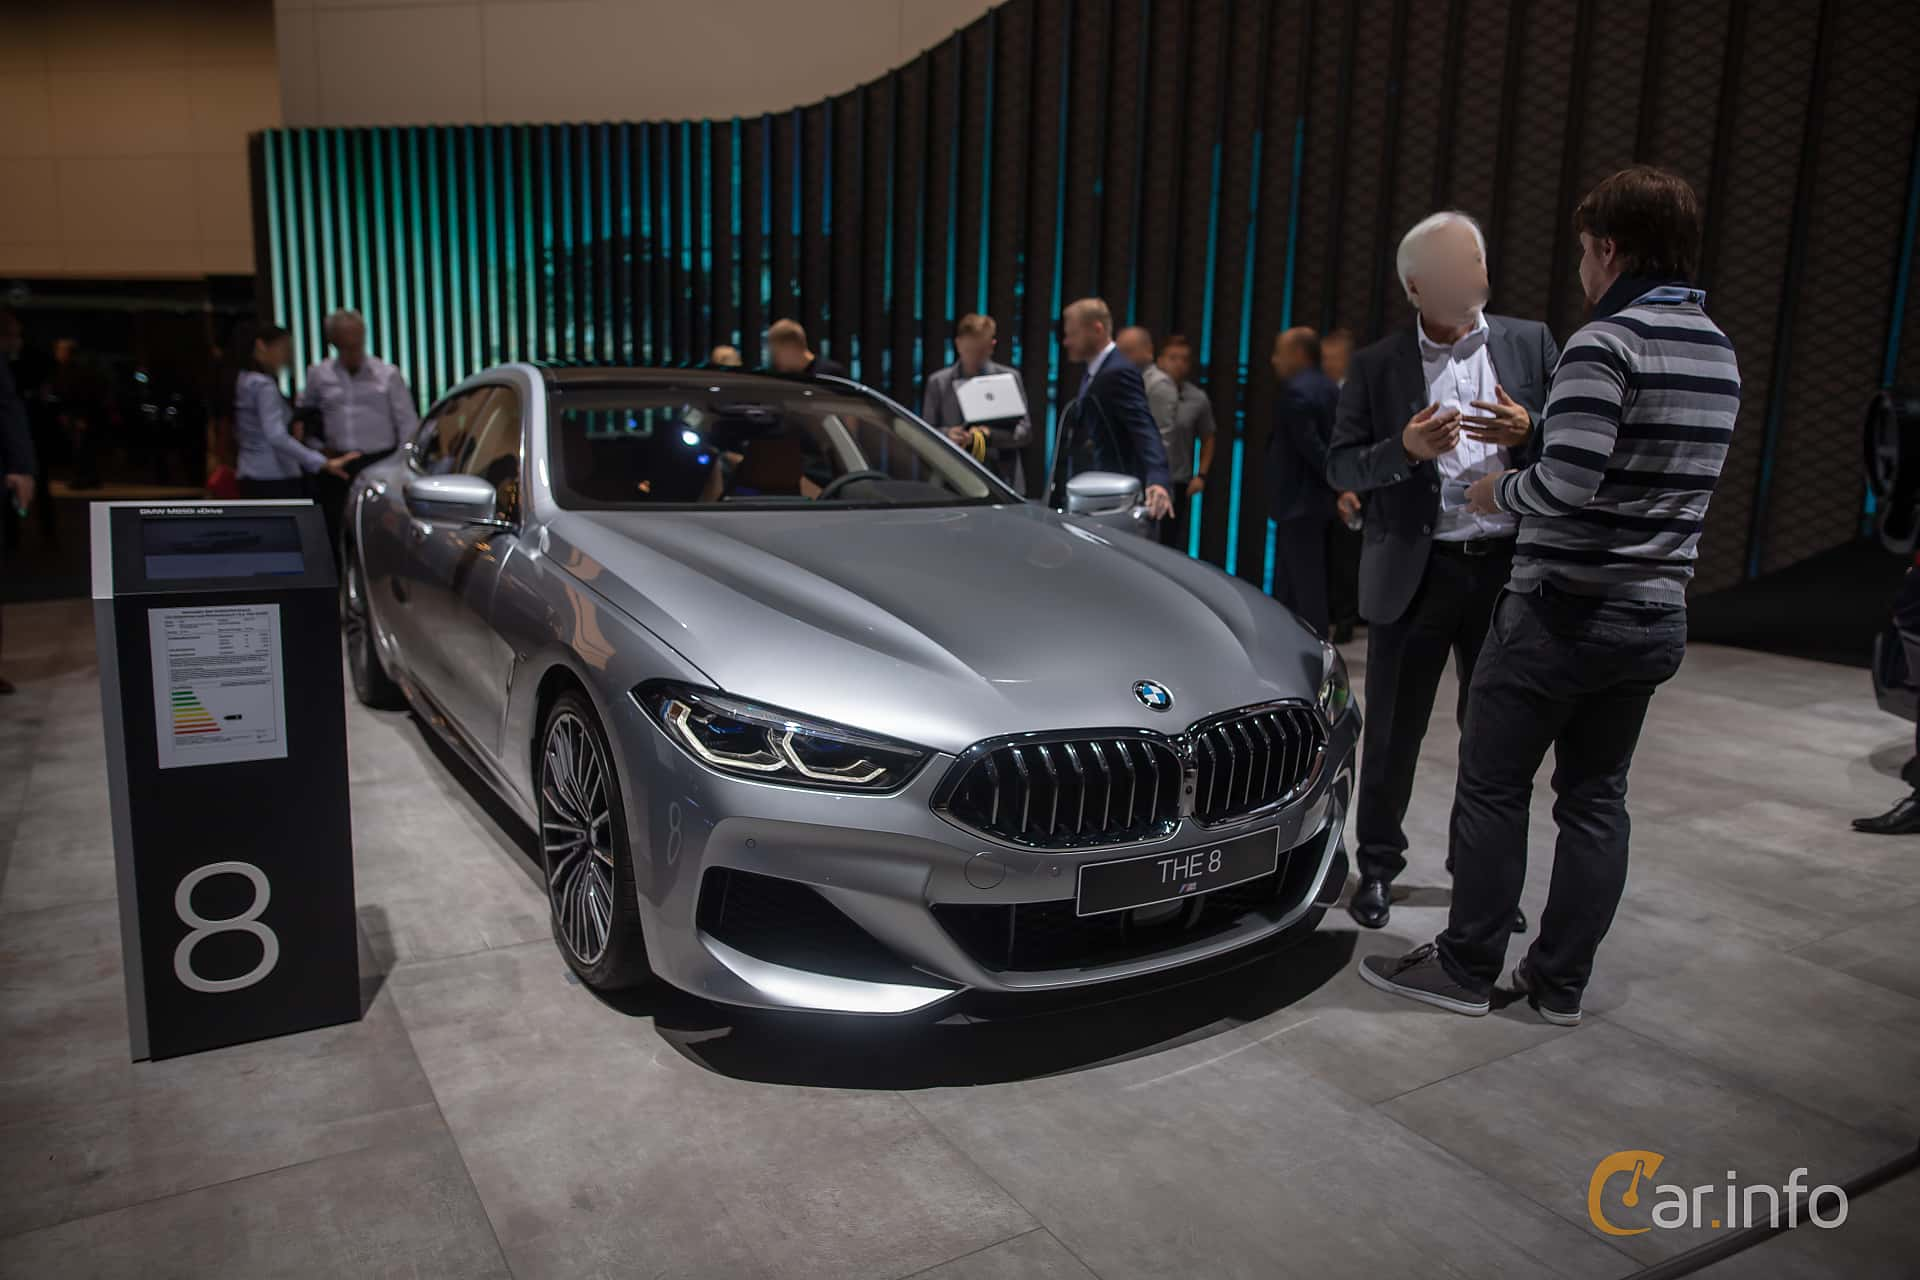 BMW M850i xDrive Gran Coupe  Steptronic, 530hp, 2020 at IAA 2019